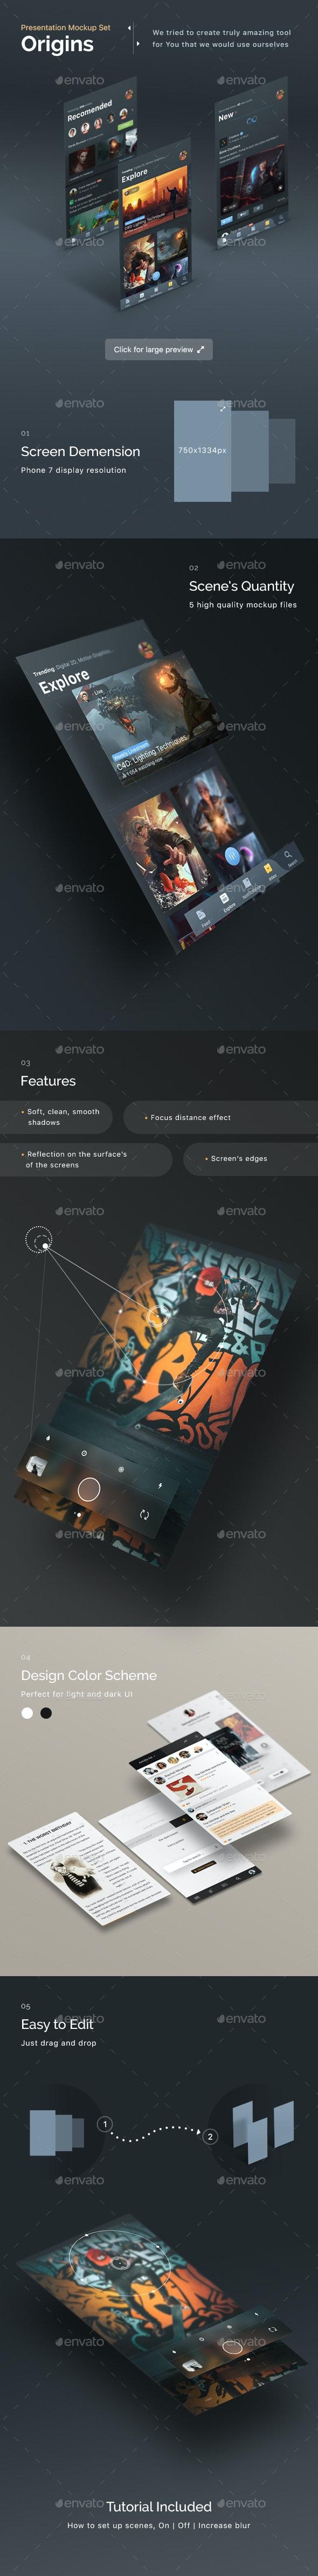 Origins - Mobile App Display Mockups - Mobile Displays